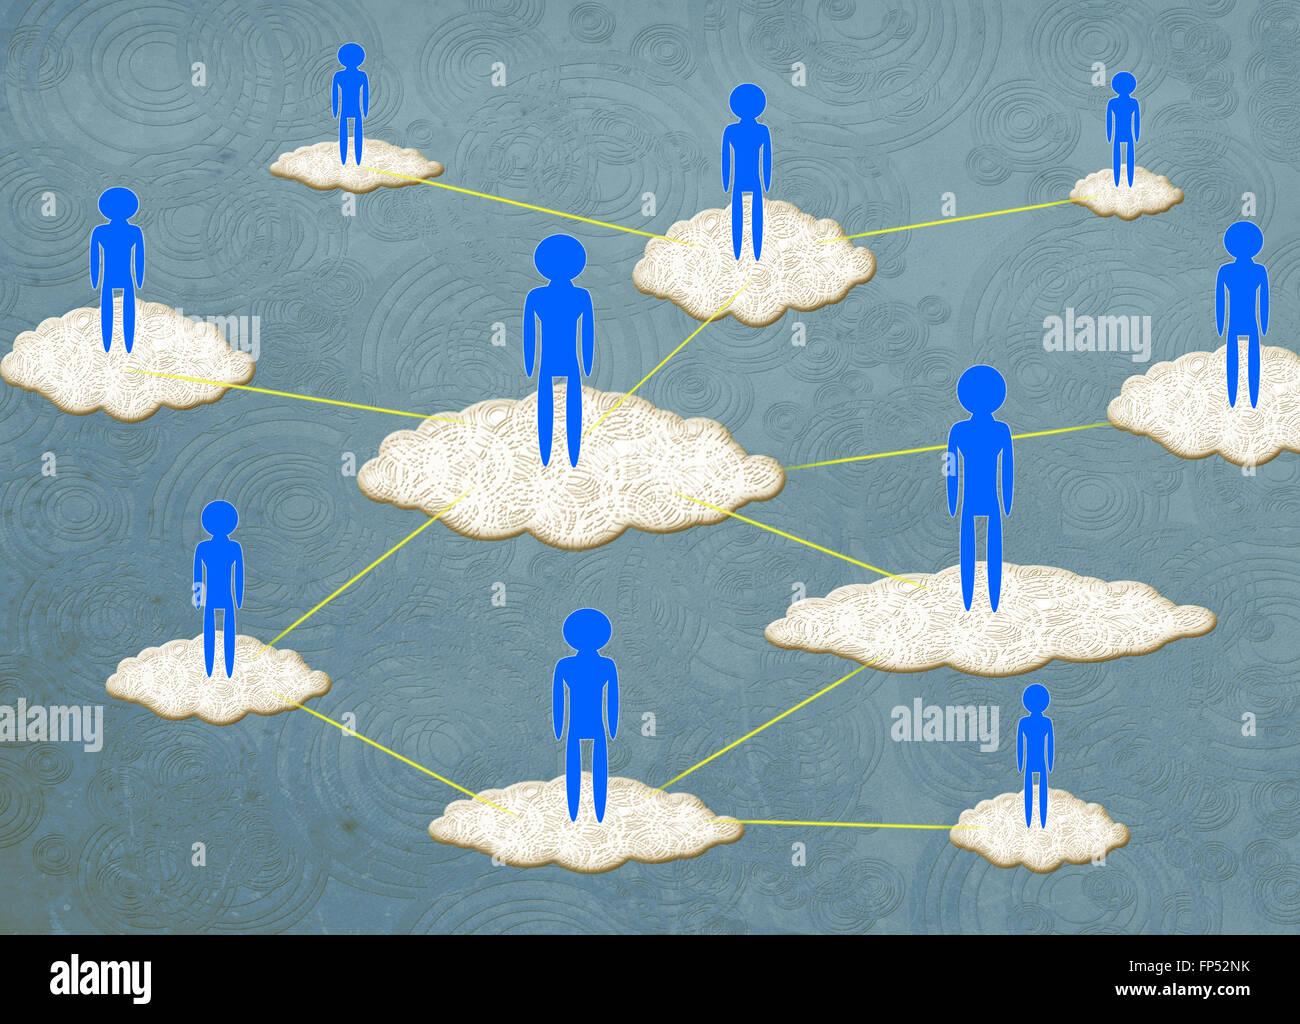 cloud computing concept digital illustration - Stock Image